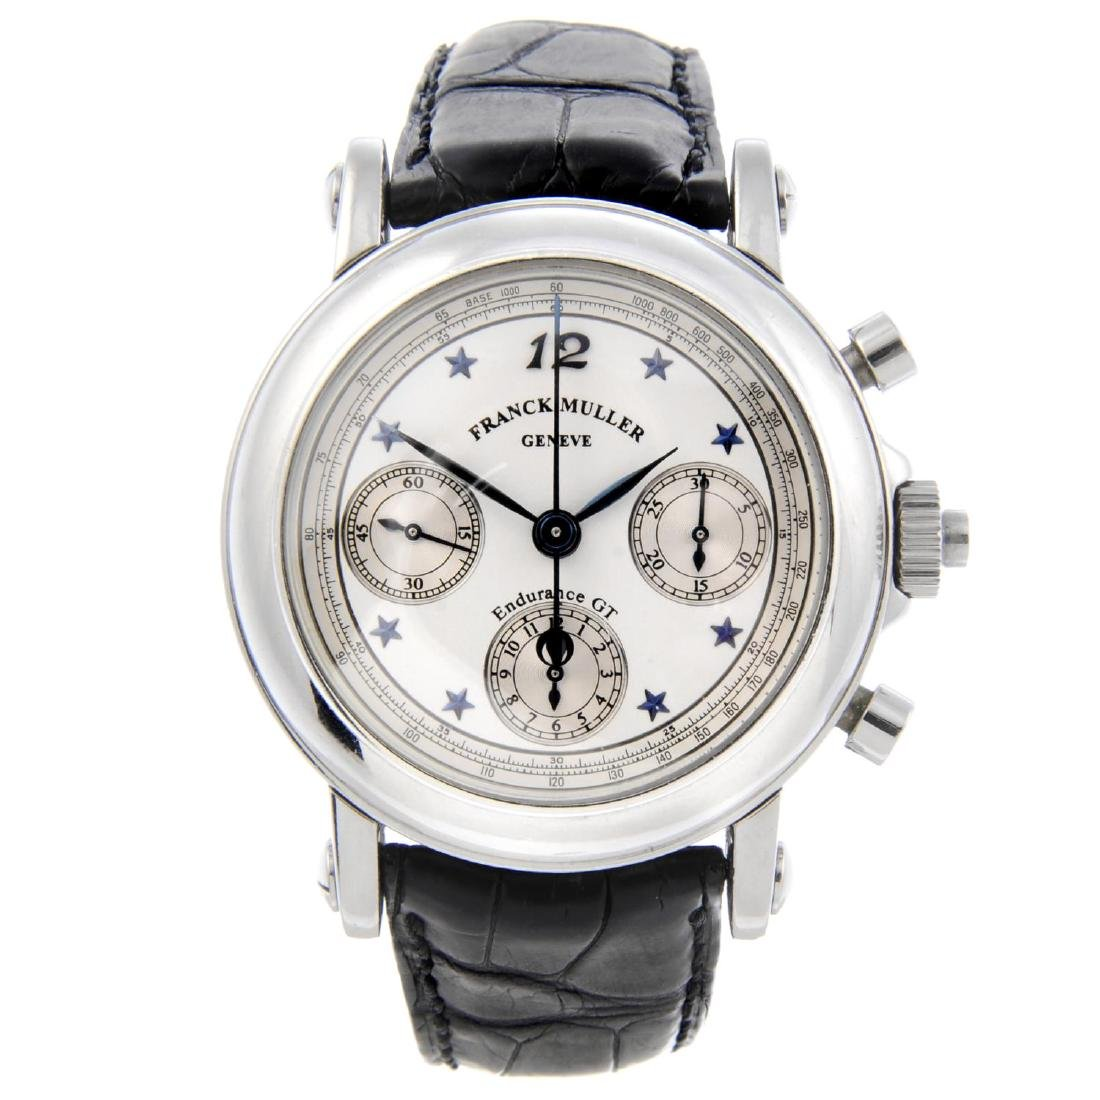 FRANCK MULLER - a gentleman's Endurance GT chronograph